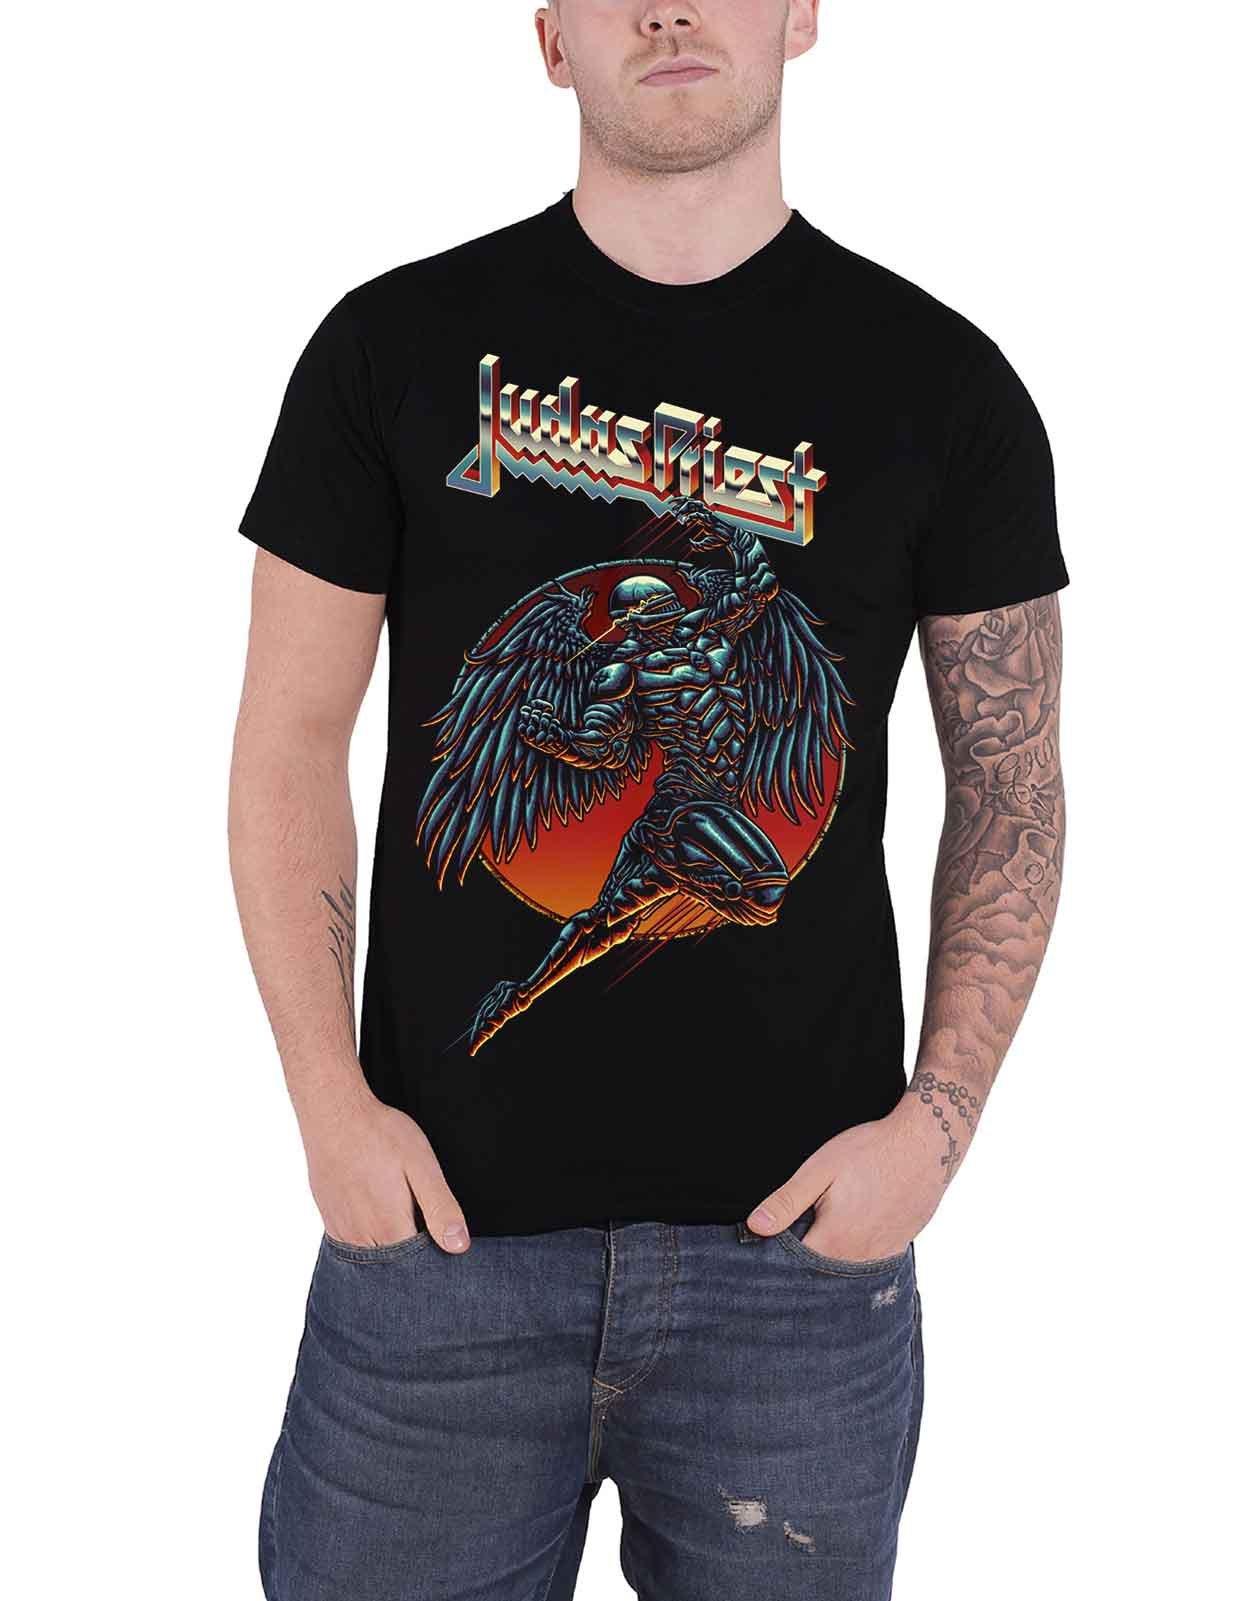 Judas Priest 'BTD Redeemer' T-Shirt (small)